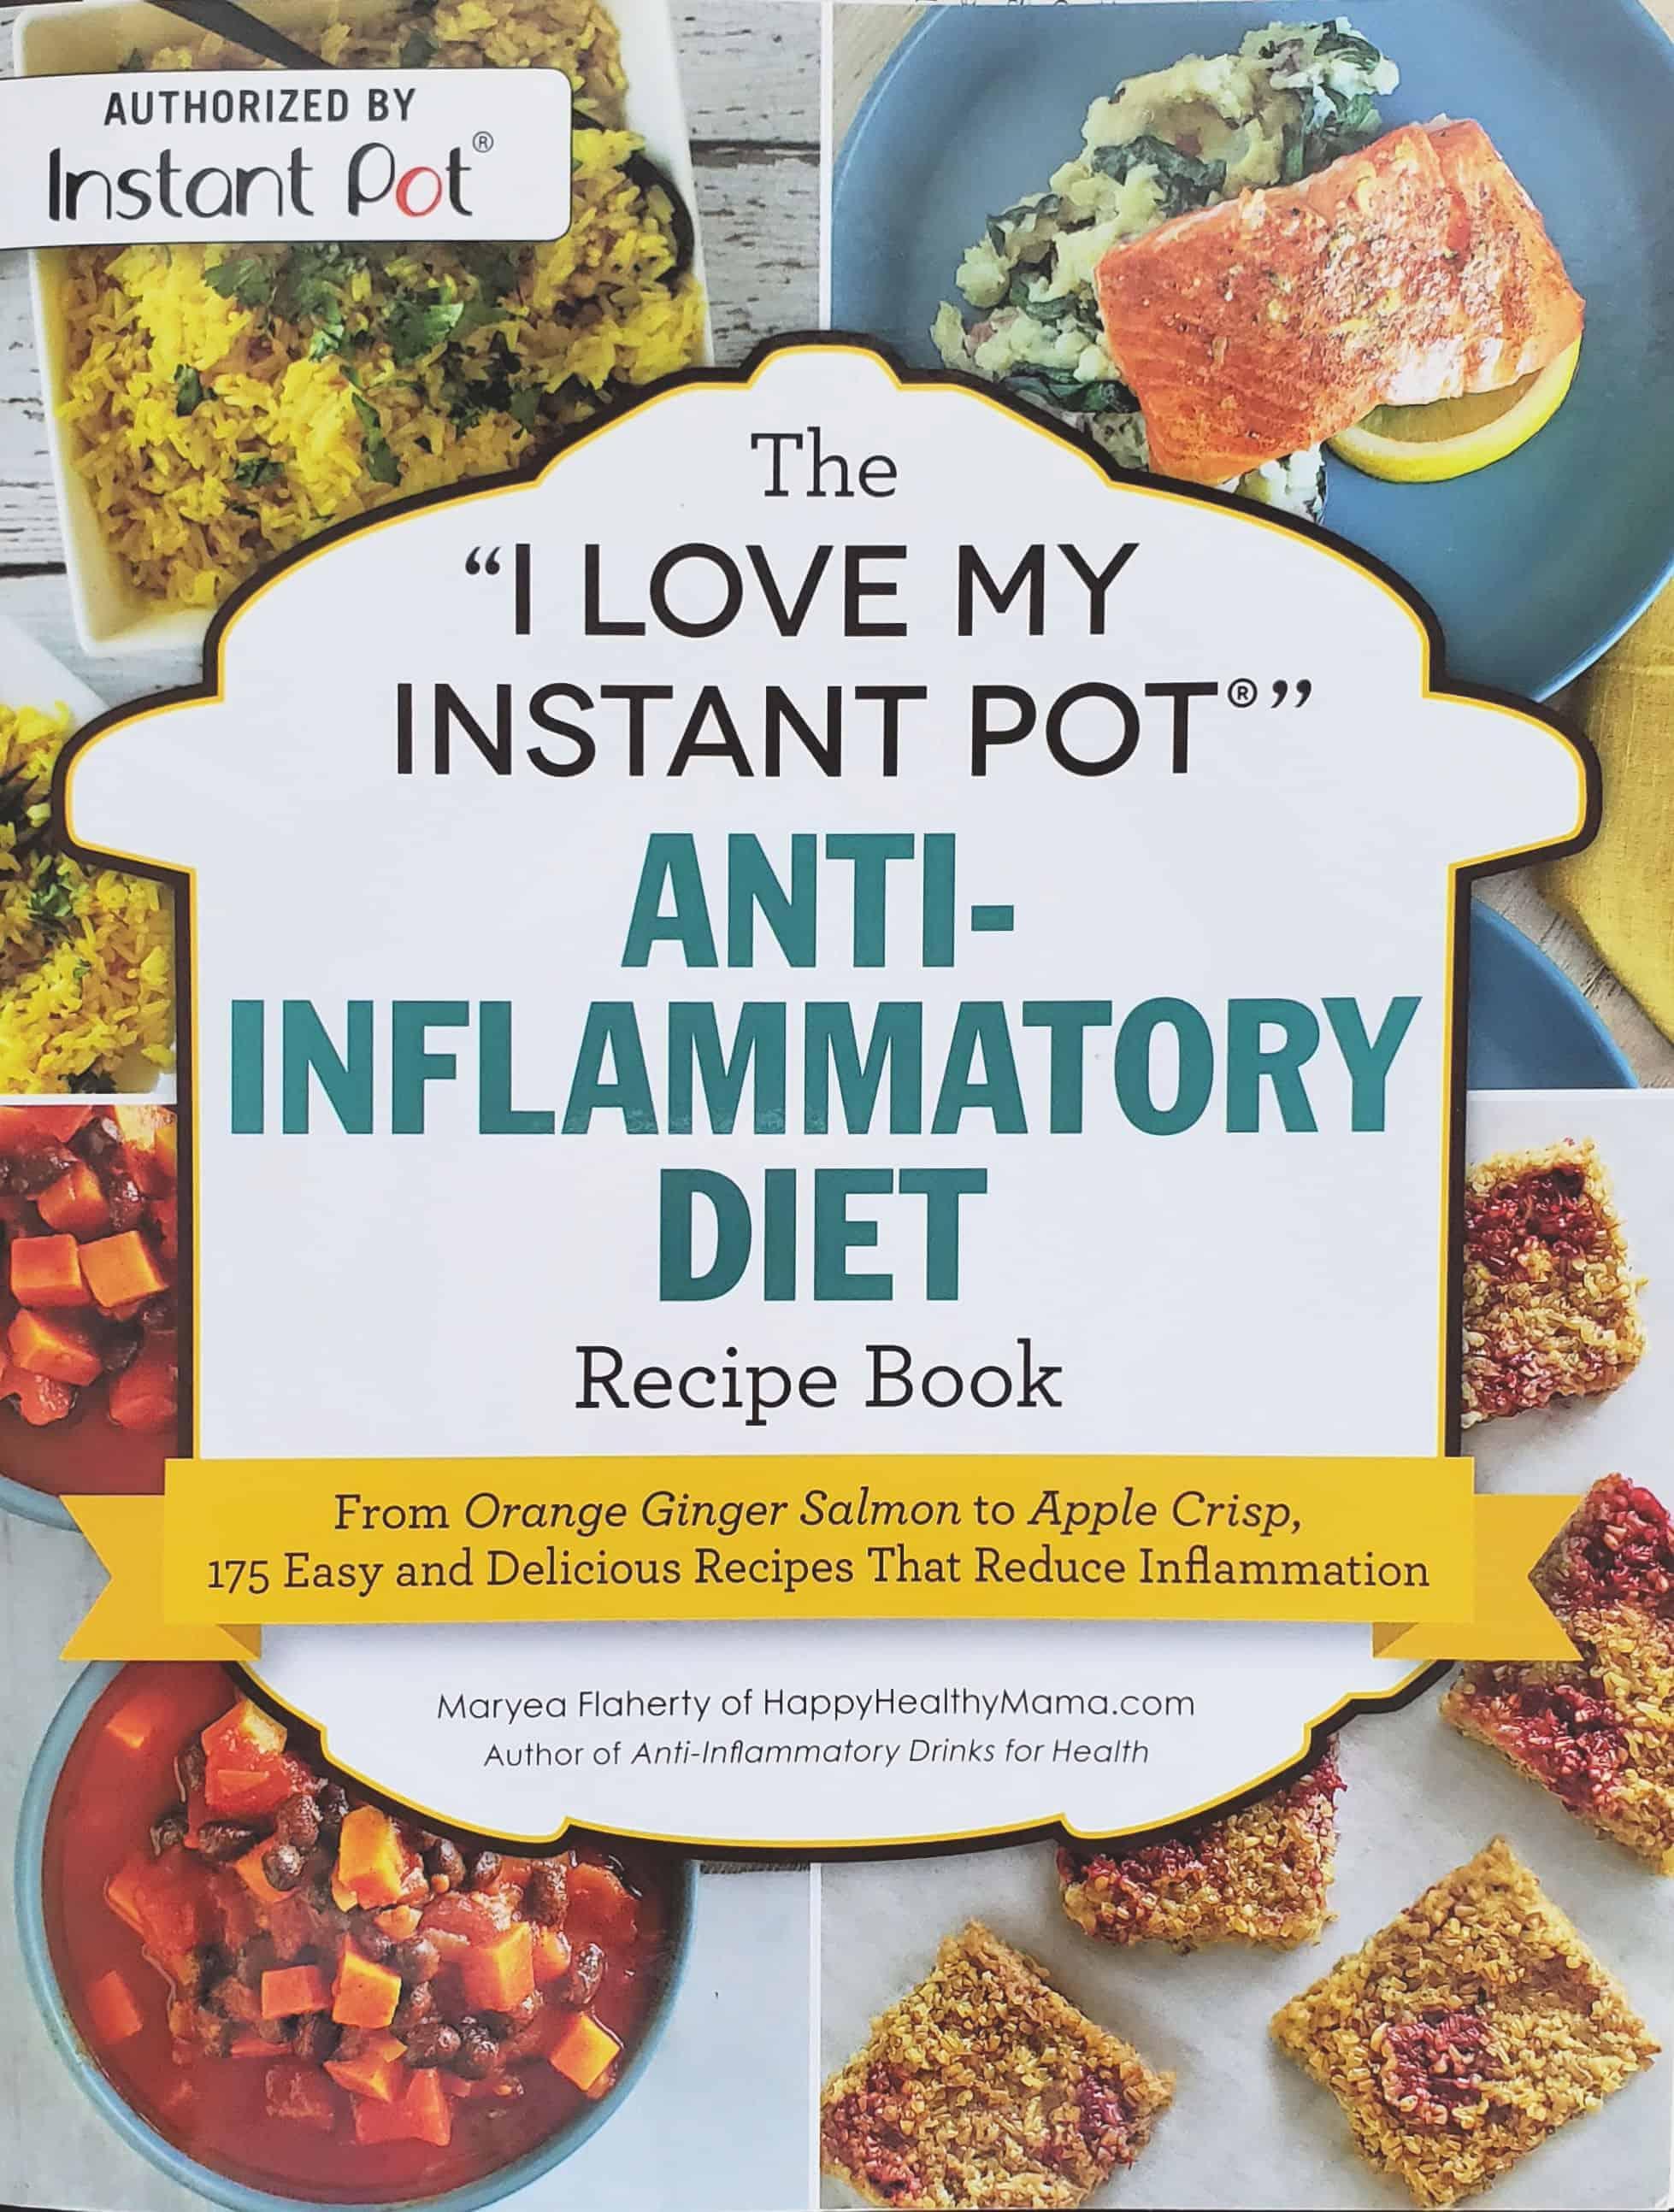 Instant Pot Cookbook Anti-Inflammatory Diety